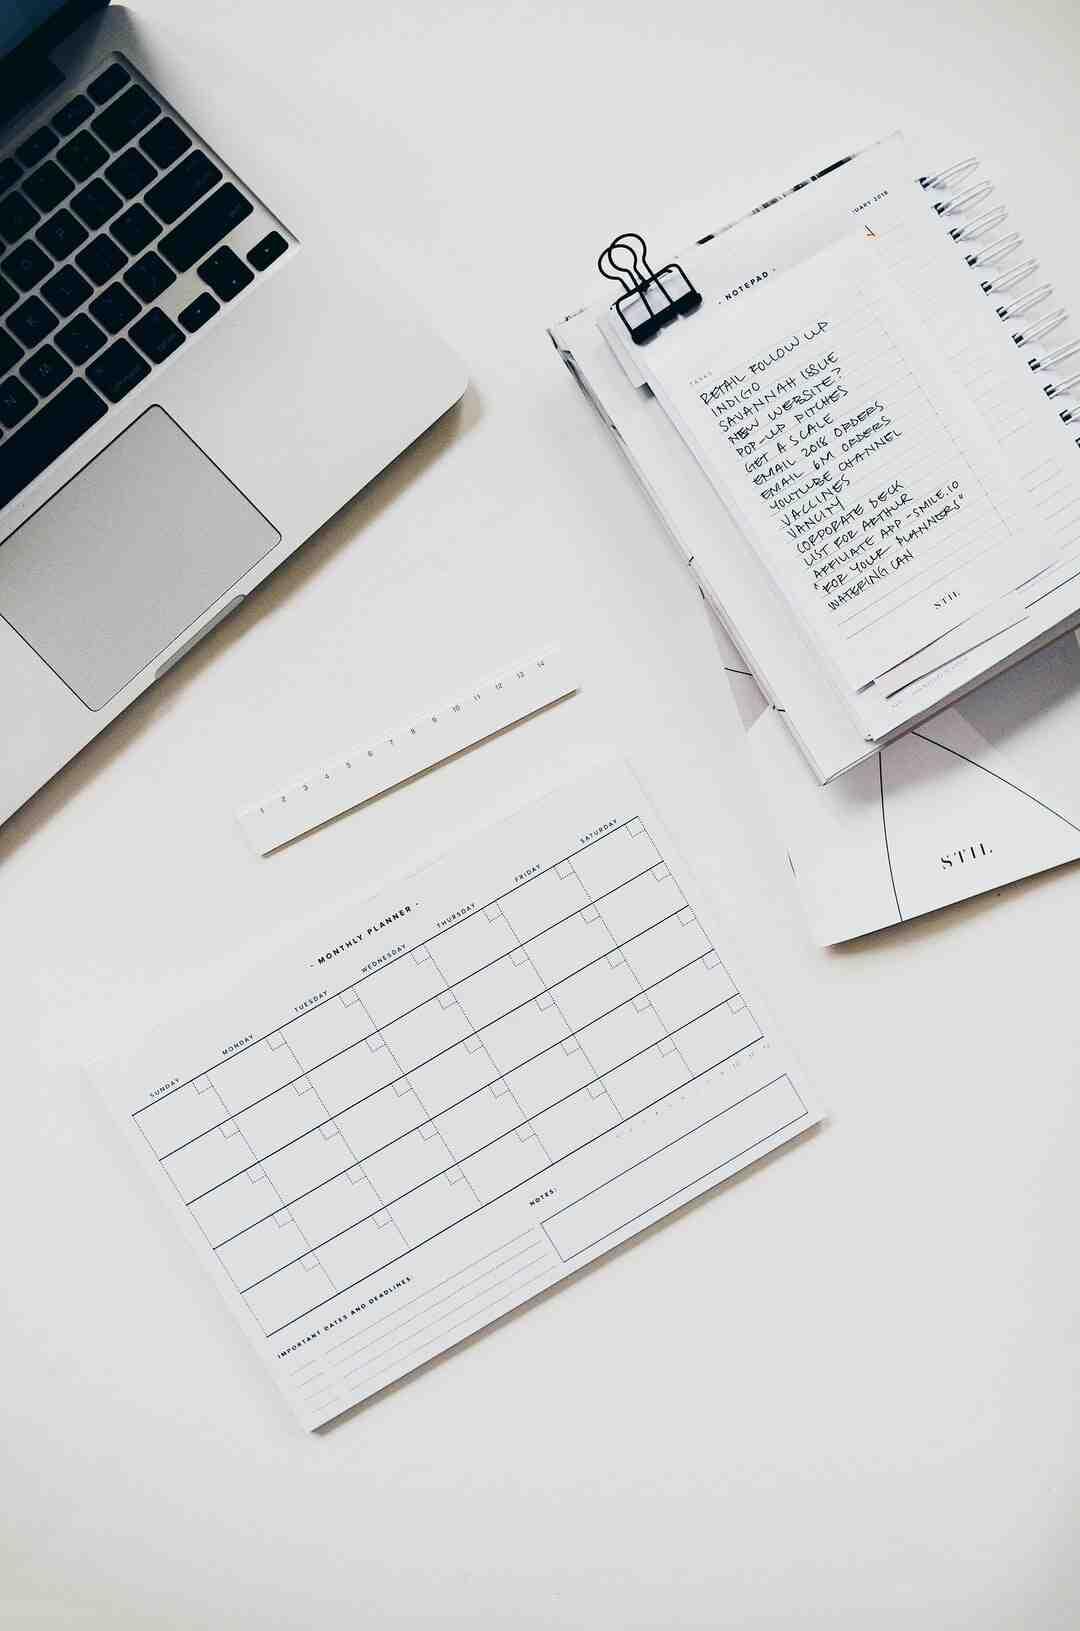 Is it hard to start blogging?